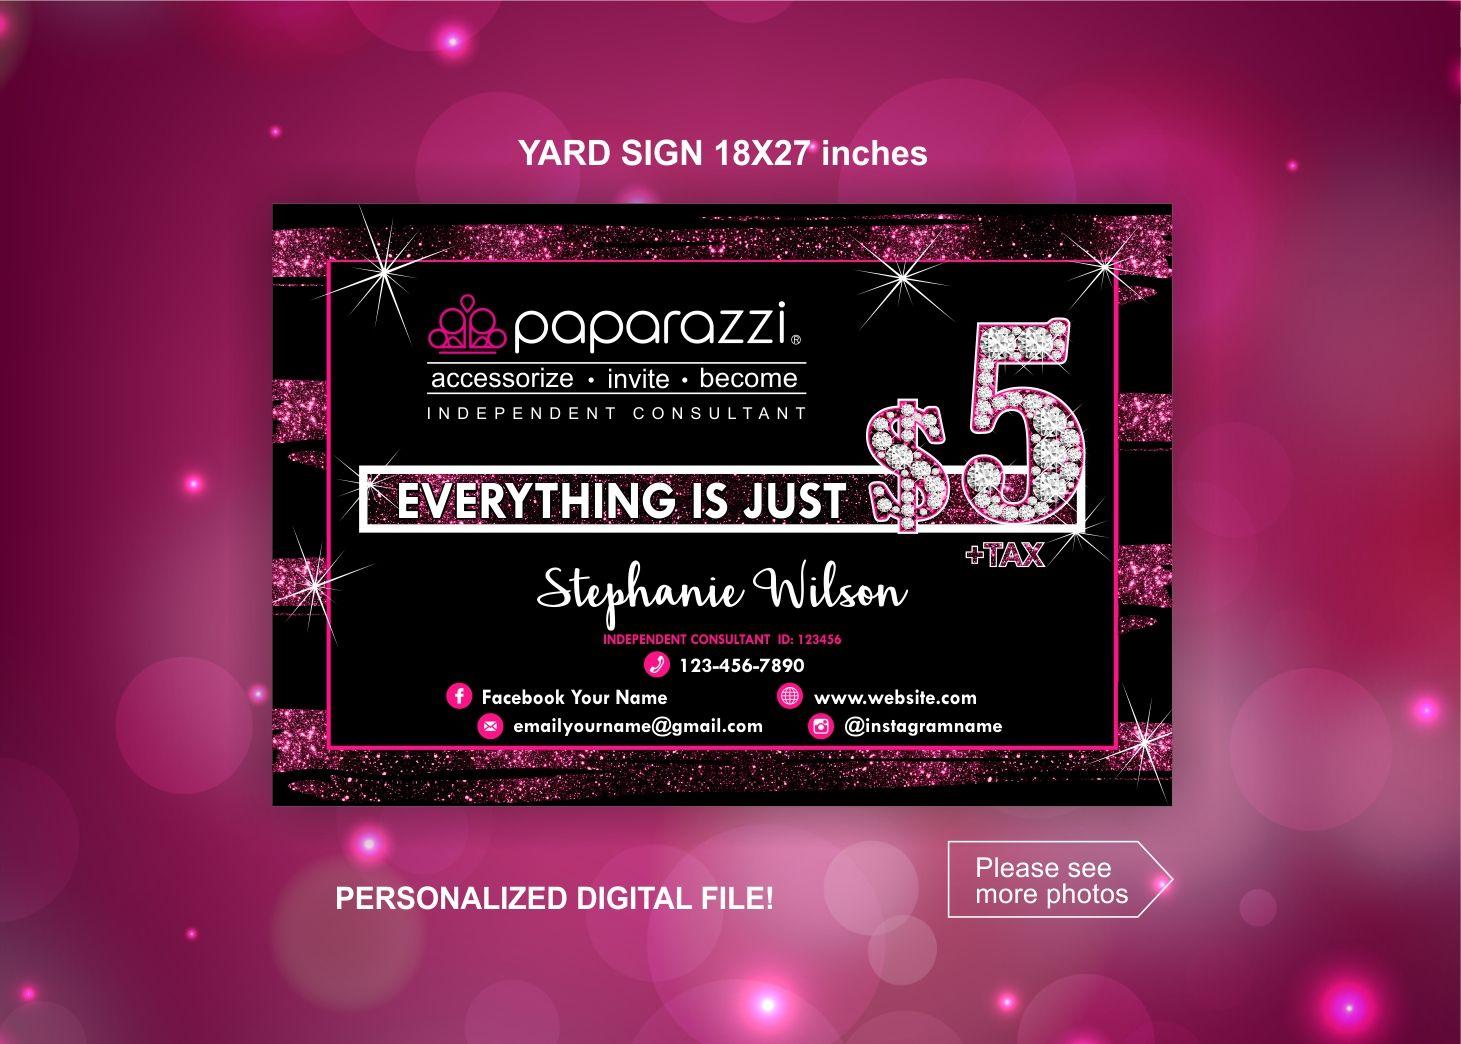 Paparazzi Yard Sign Paparazzi Shop Banner Paparazzi Pop Up